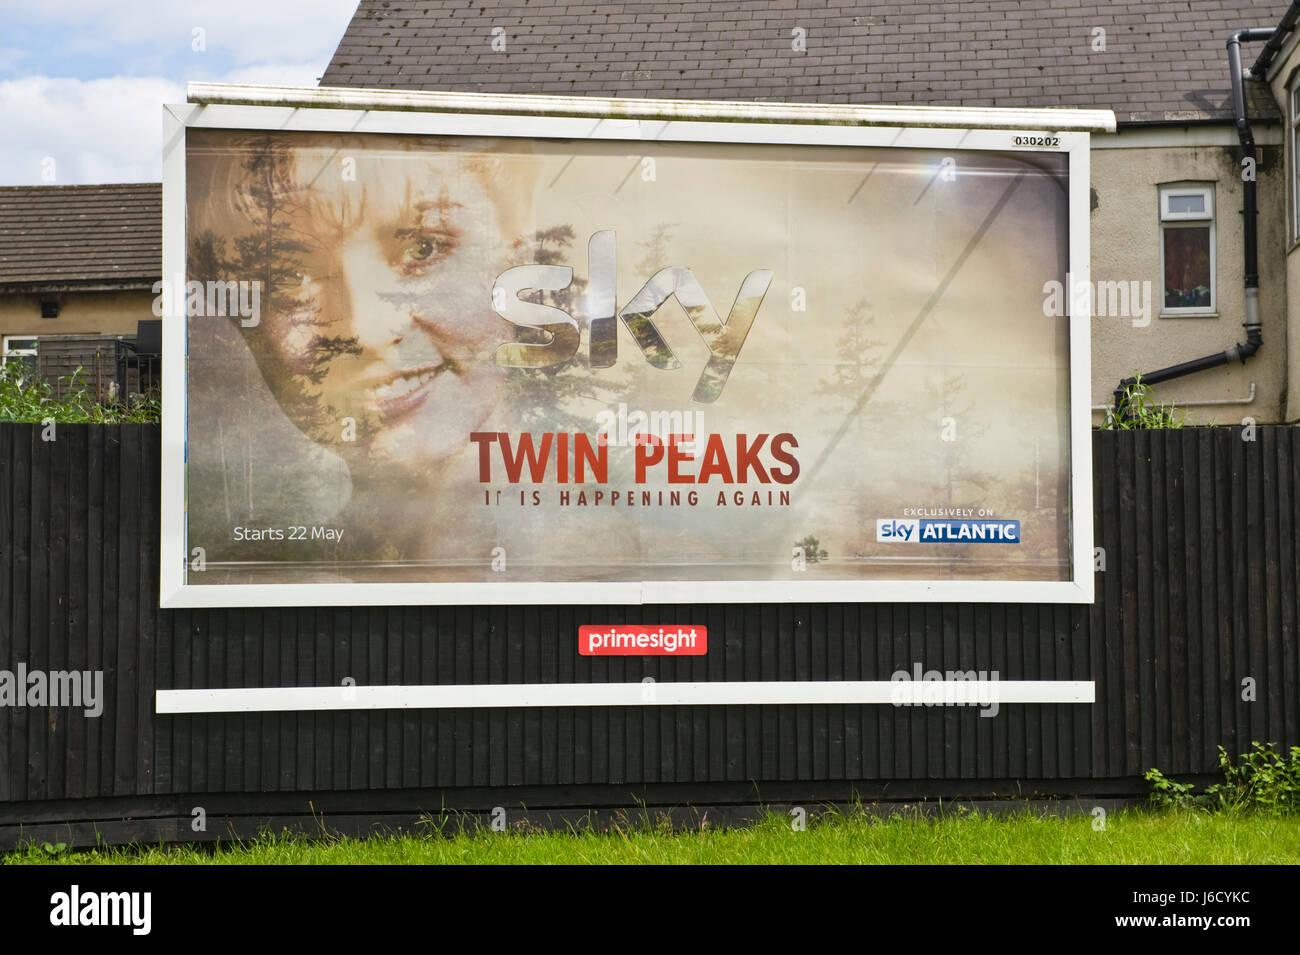 Sky Atlantic 48 sheet advertising billboard on Primesight site in Newport, South Wales, UK - Stock Image